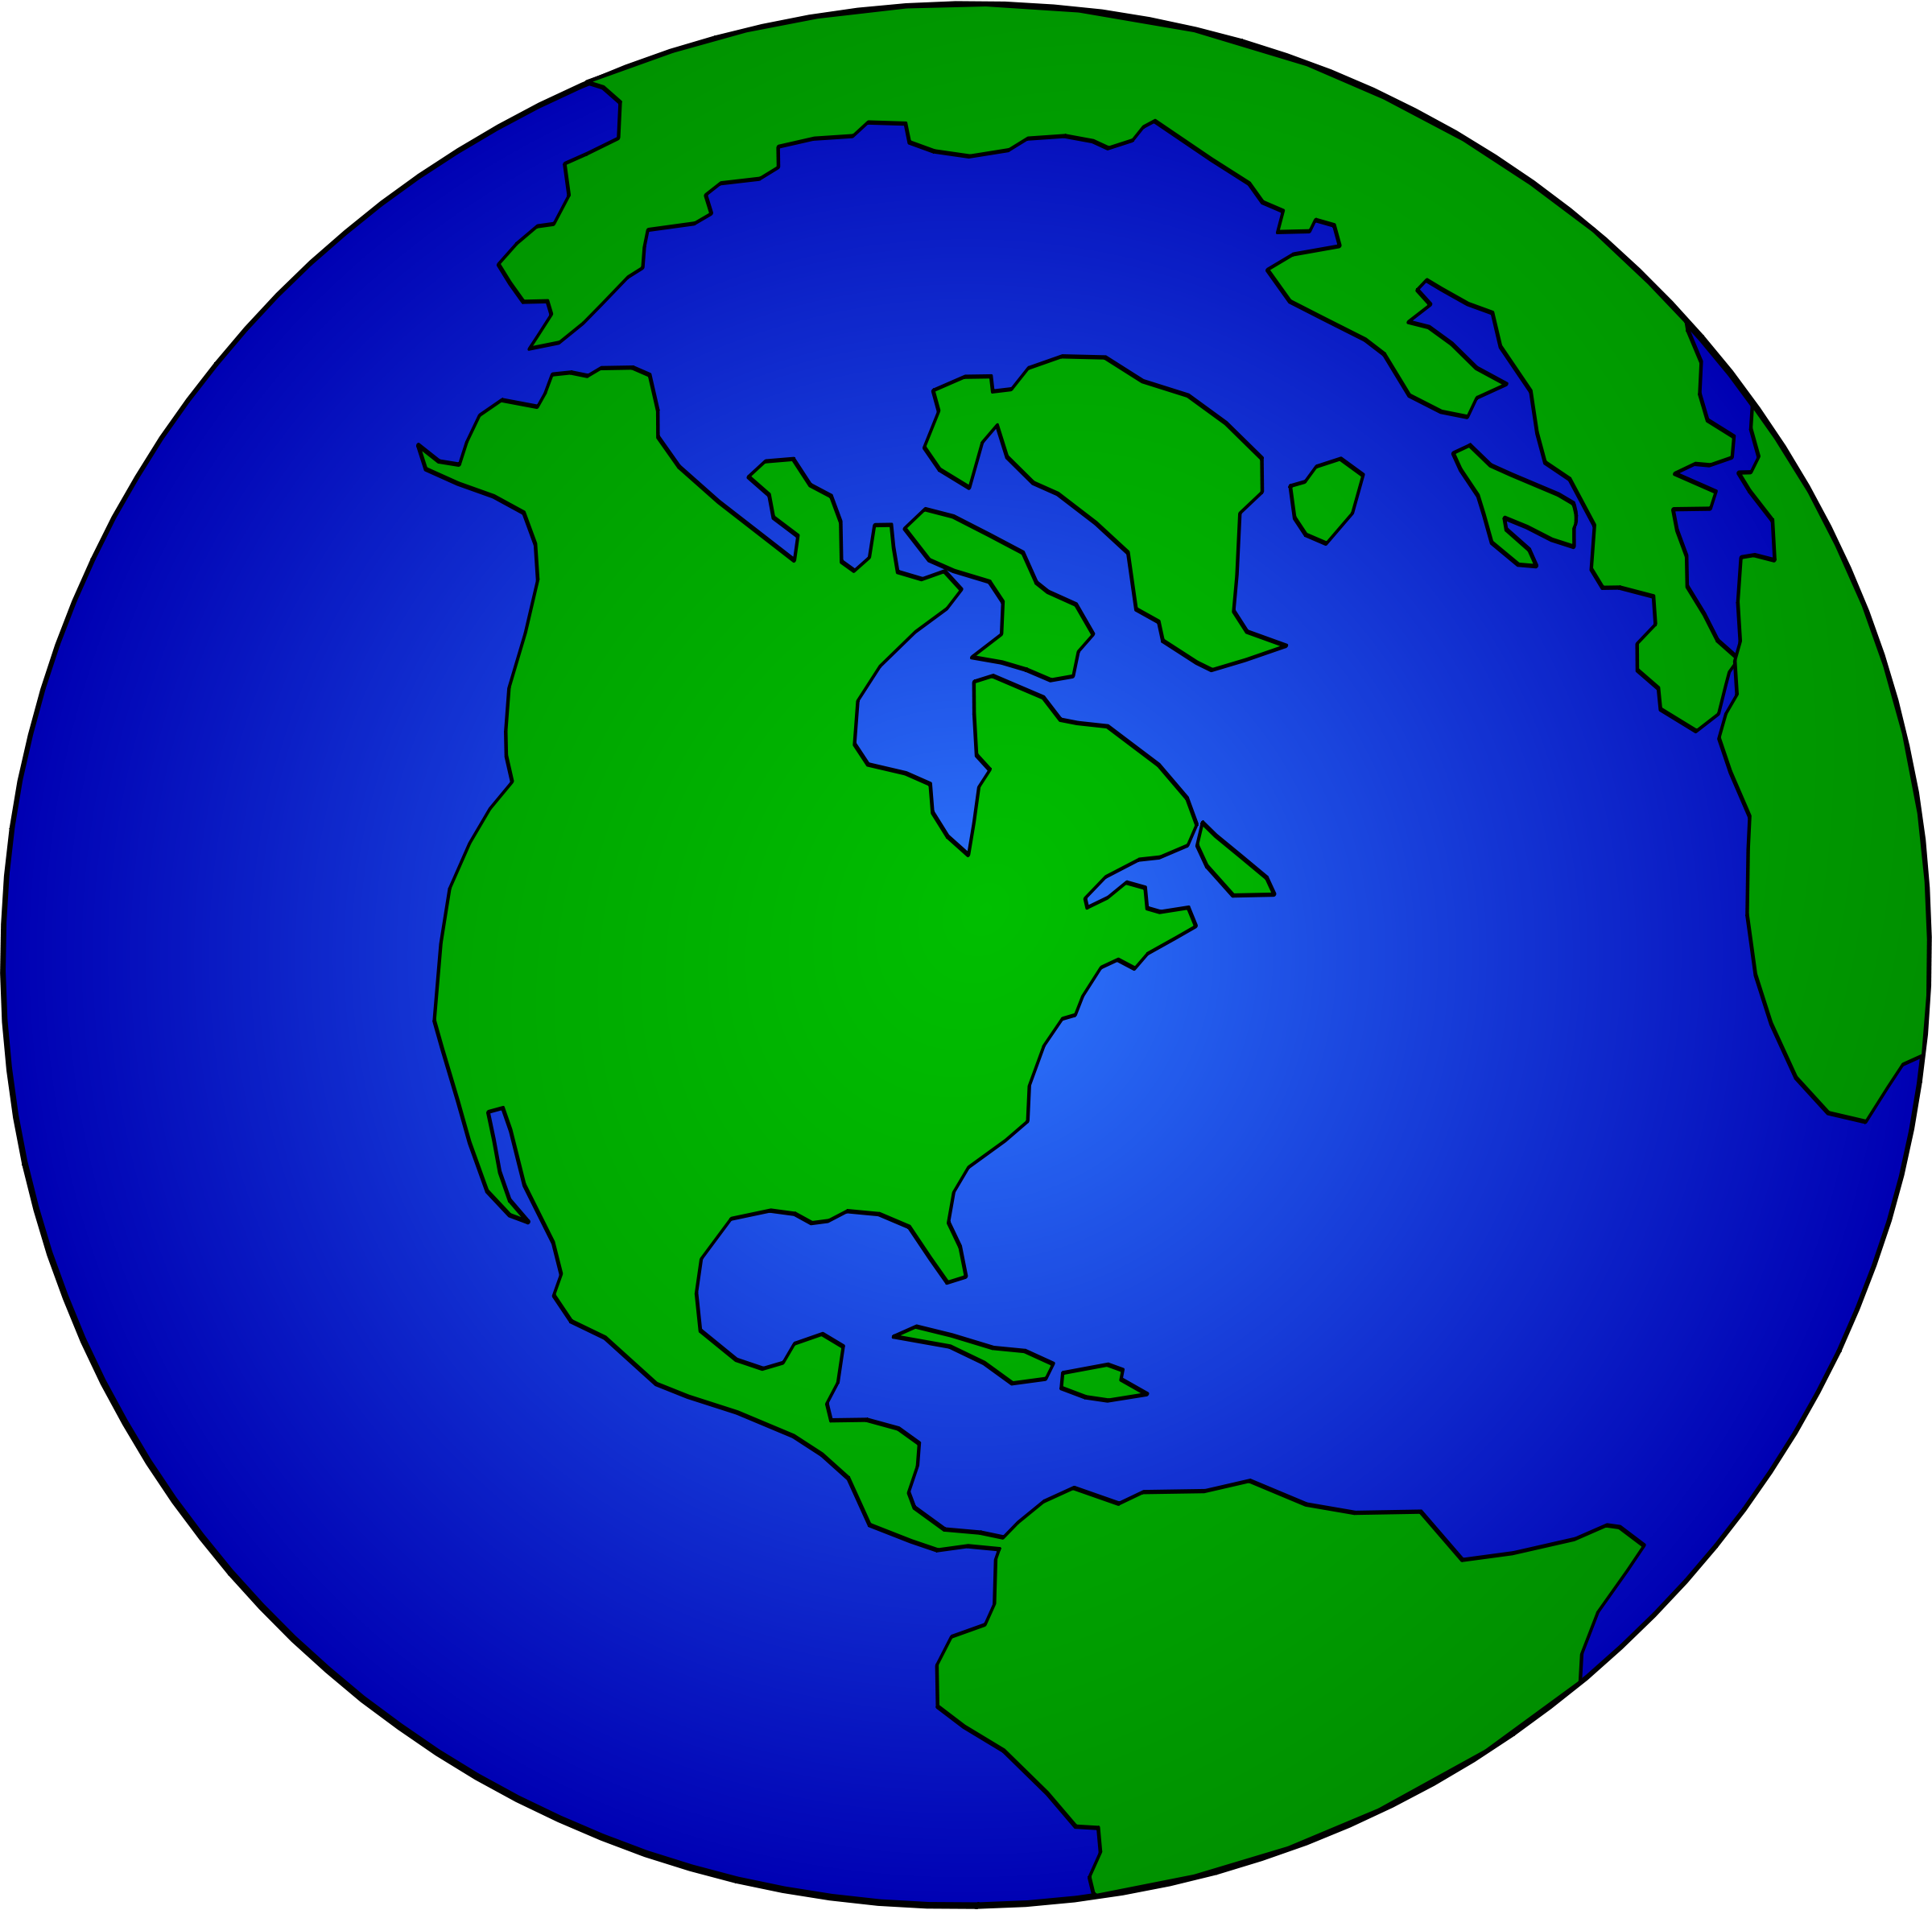 World Image Clip Art-World Image Clip Art-0